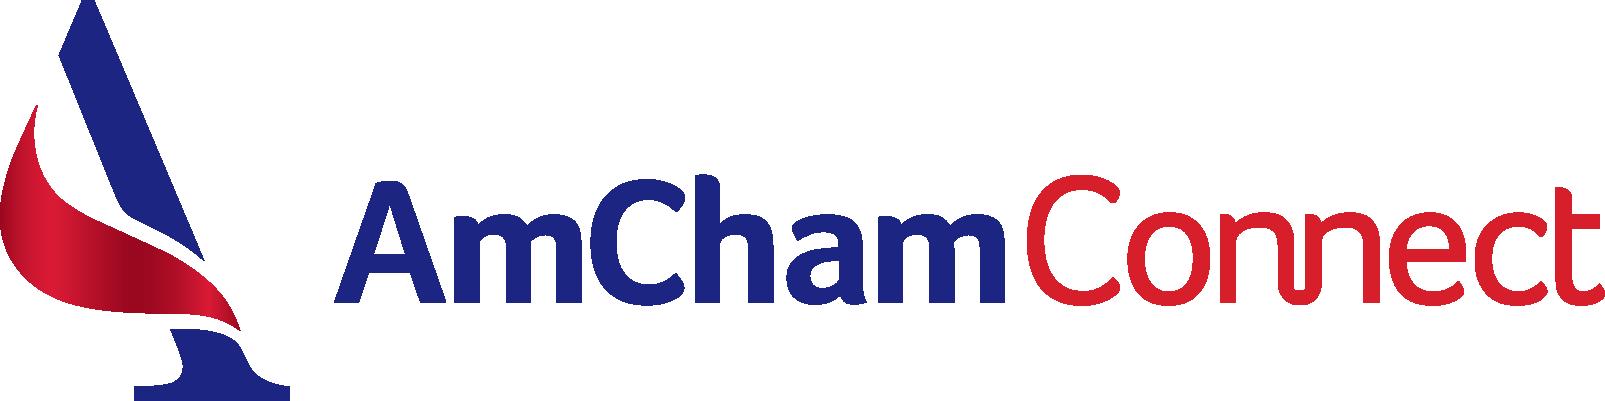 AmCham Connect